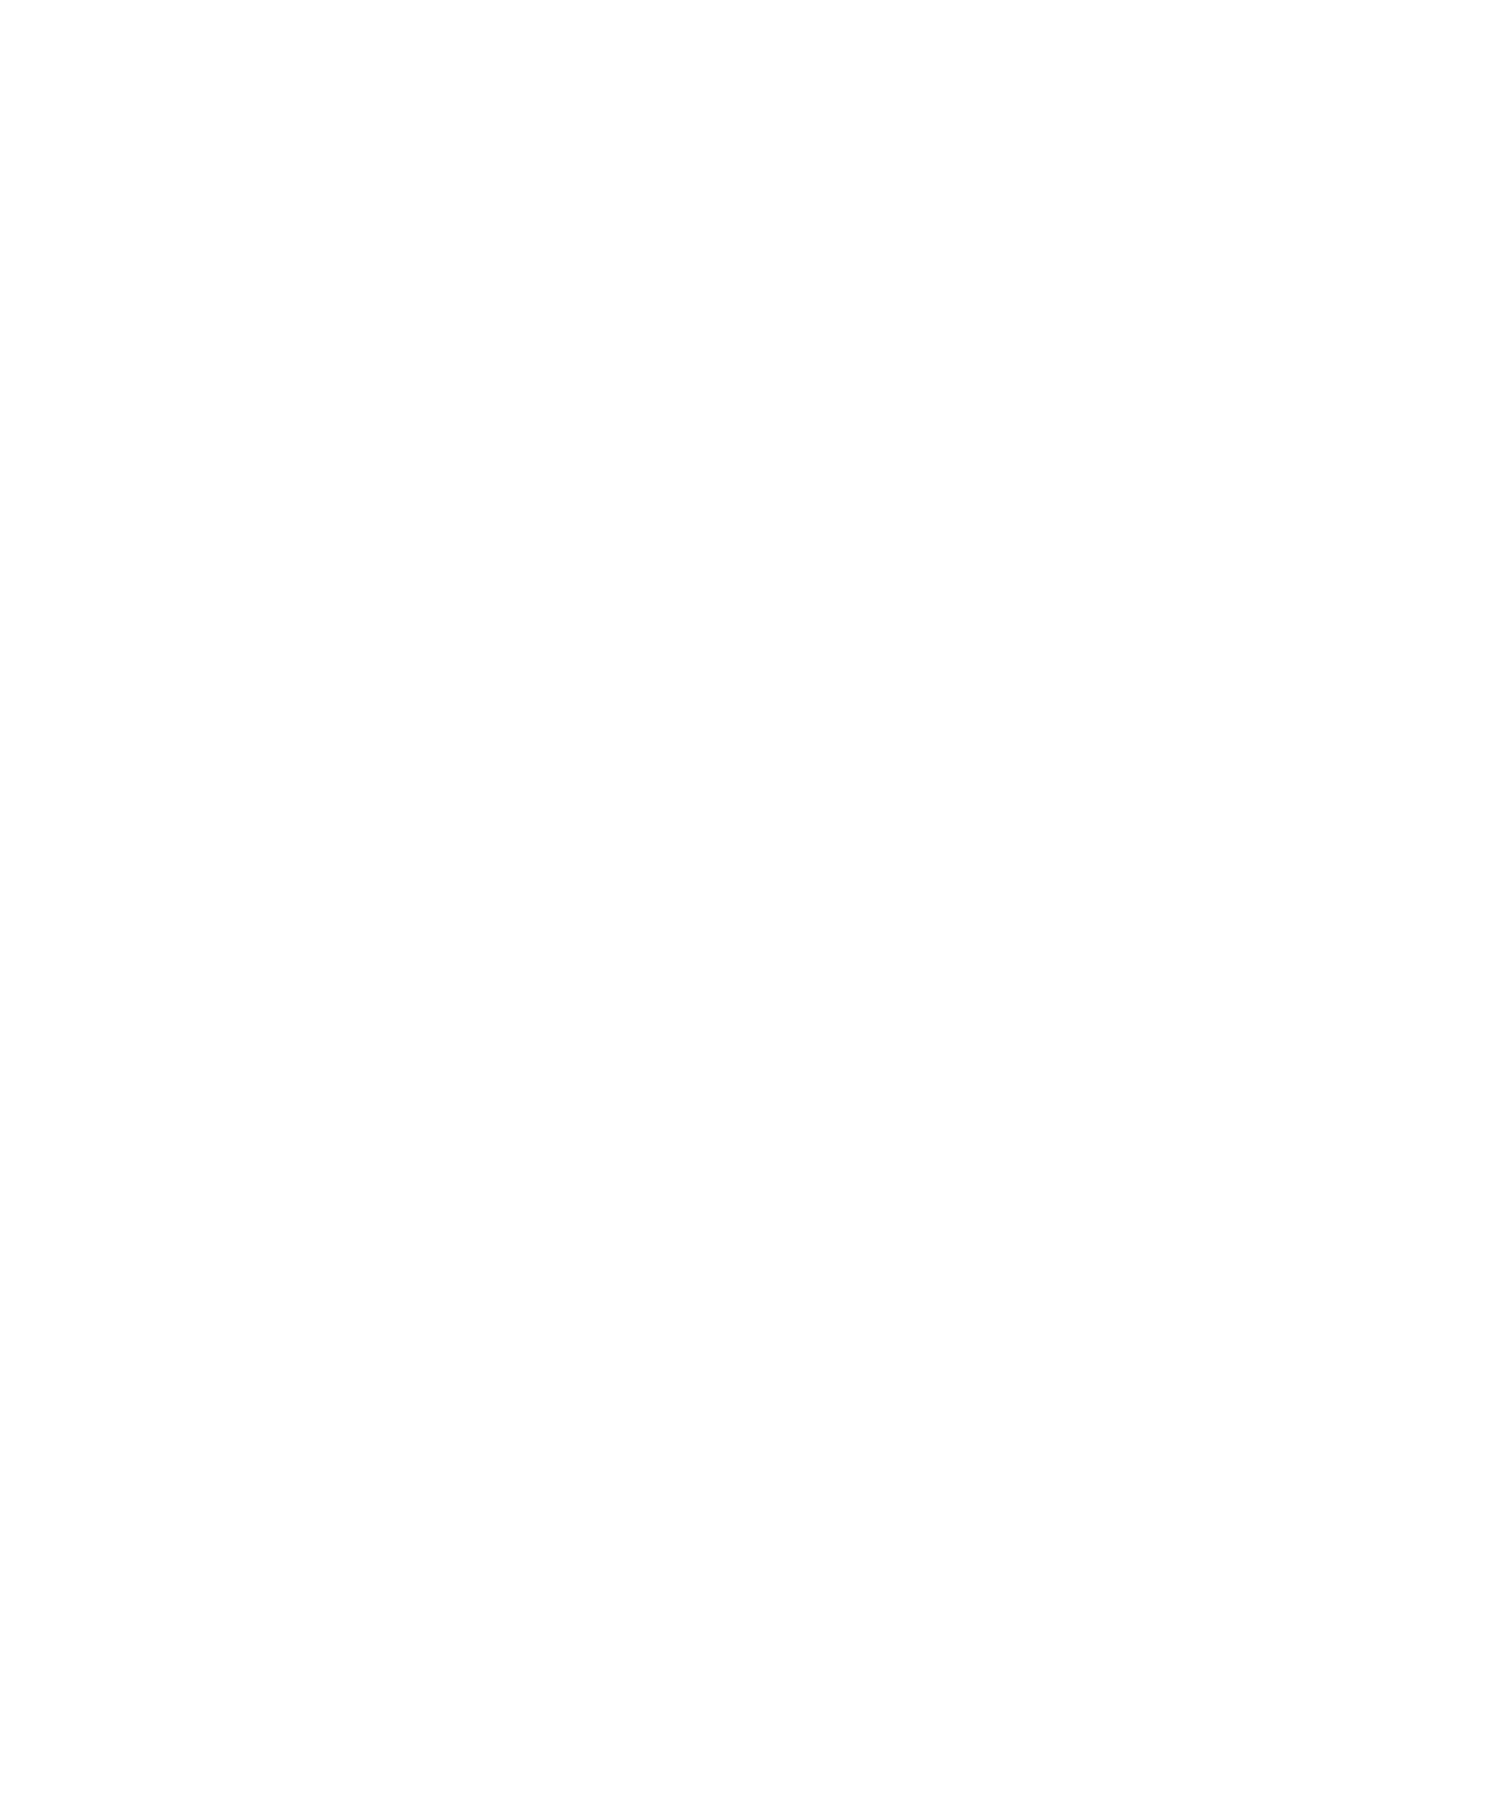 COLLAGE GALLARDAGALANTE(コラージュ ガリャルダガランテ) 【いいとこどりの嬉しい服】カーディガンドッキング風ワンピース